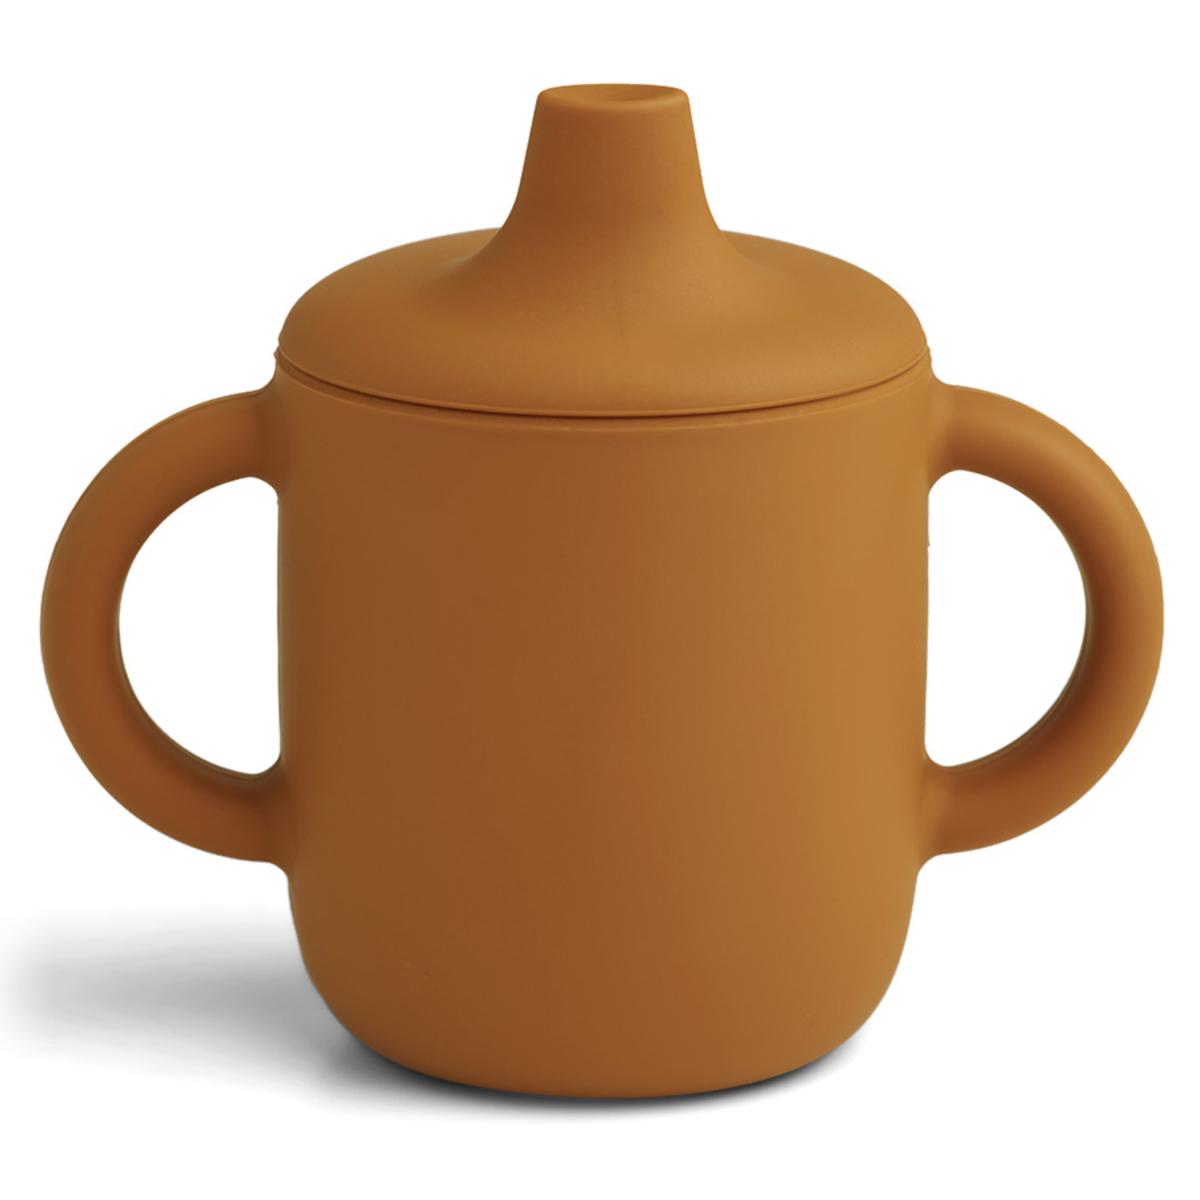 Tasse & Verre Tasse d'Apprentissage Neil Mustard - 150 ml Tasse d'Apprentissage Neil Mustard - 150 ml